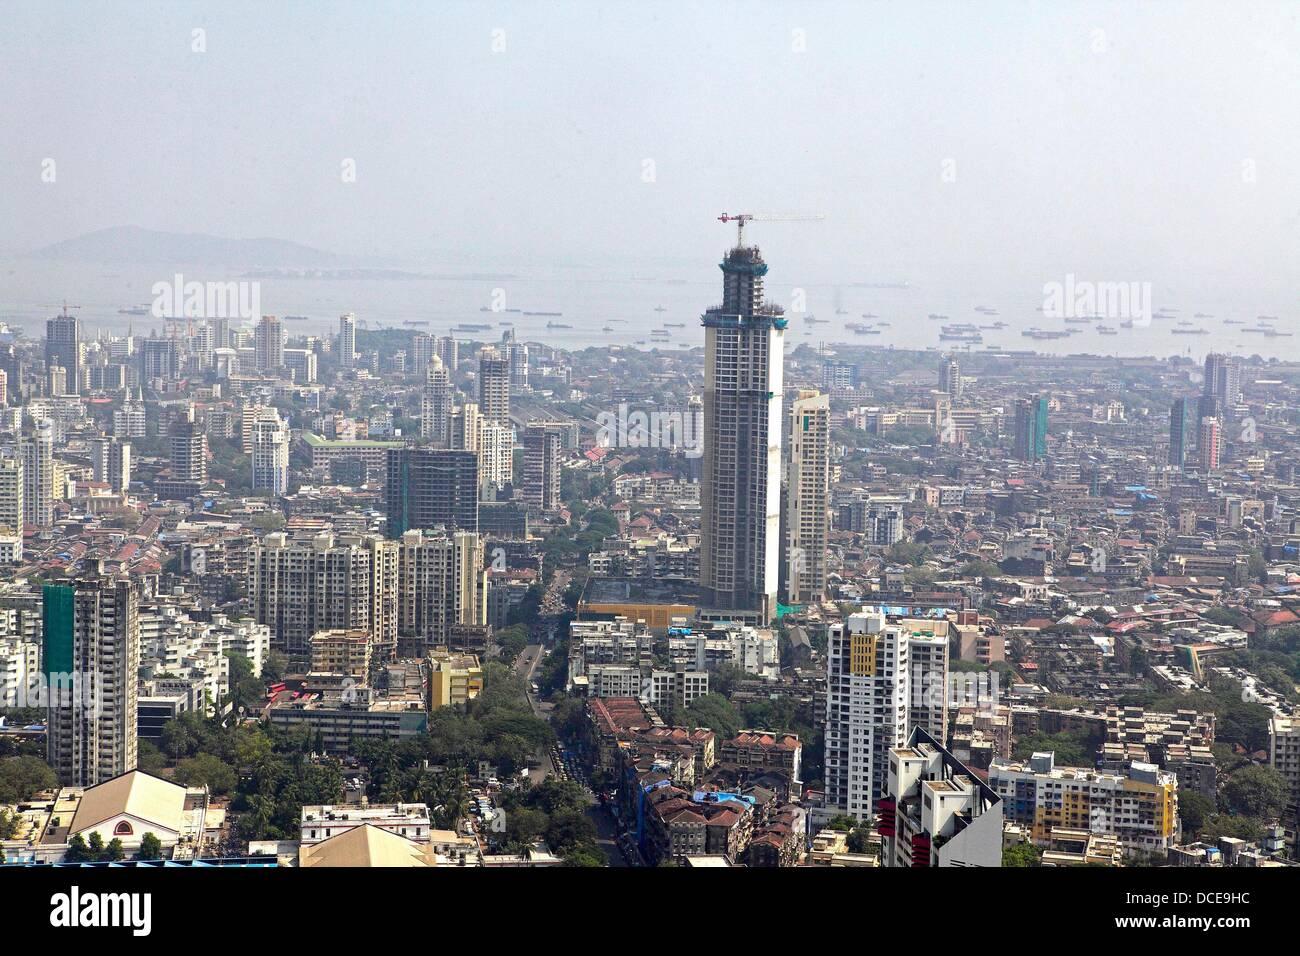 November 2, 2010 - Mumbai, Maharashtra, India - Ariel view of the Skyline of  Mumbai shows newly constrcuted luxury - Stock Image